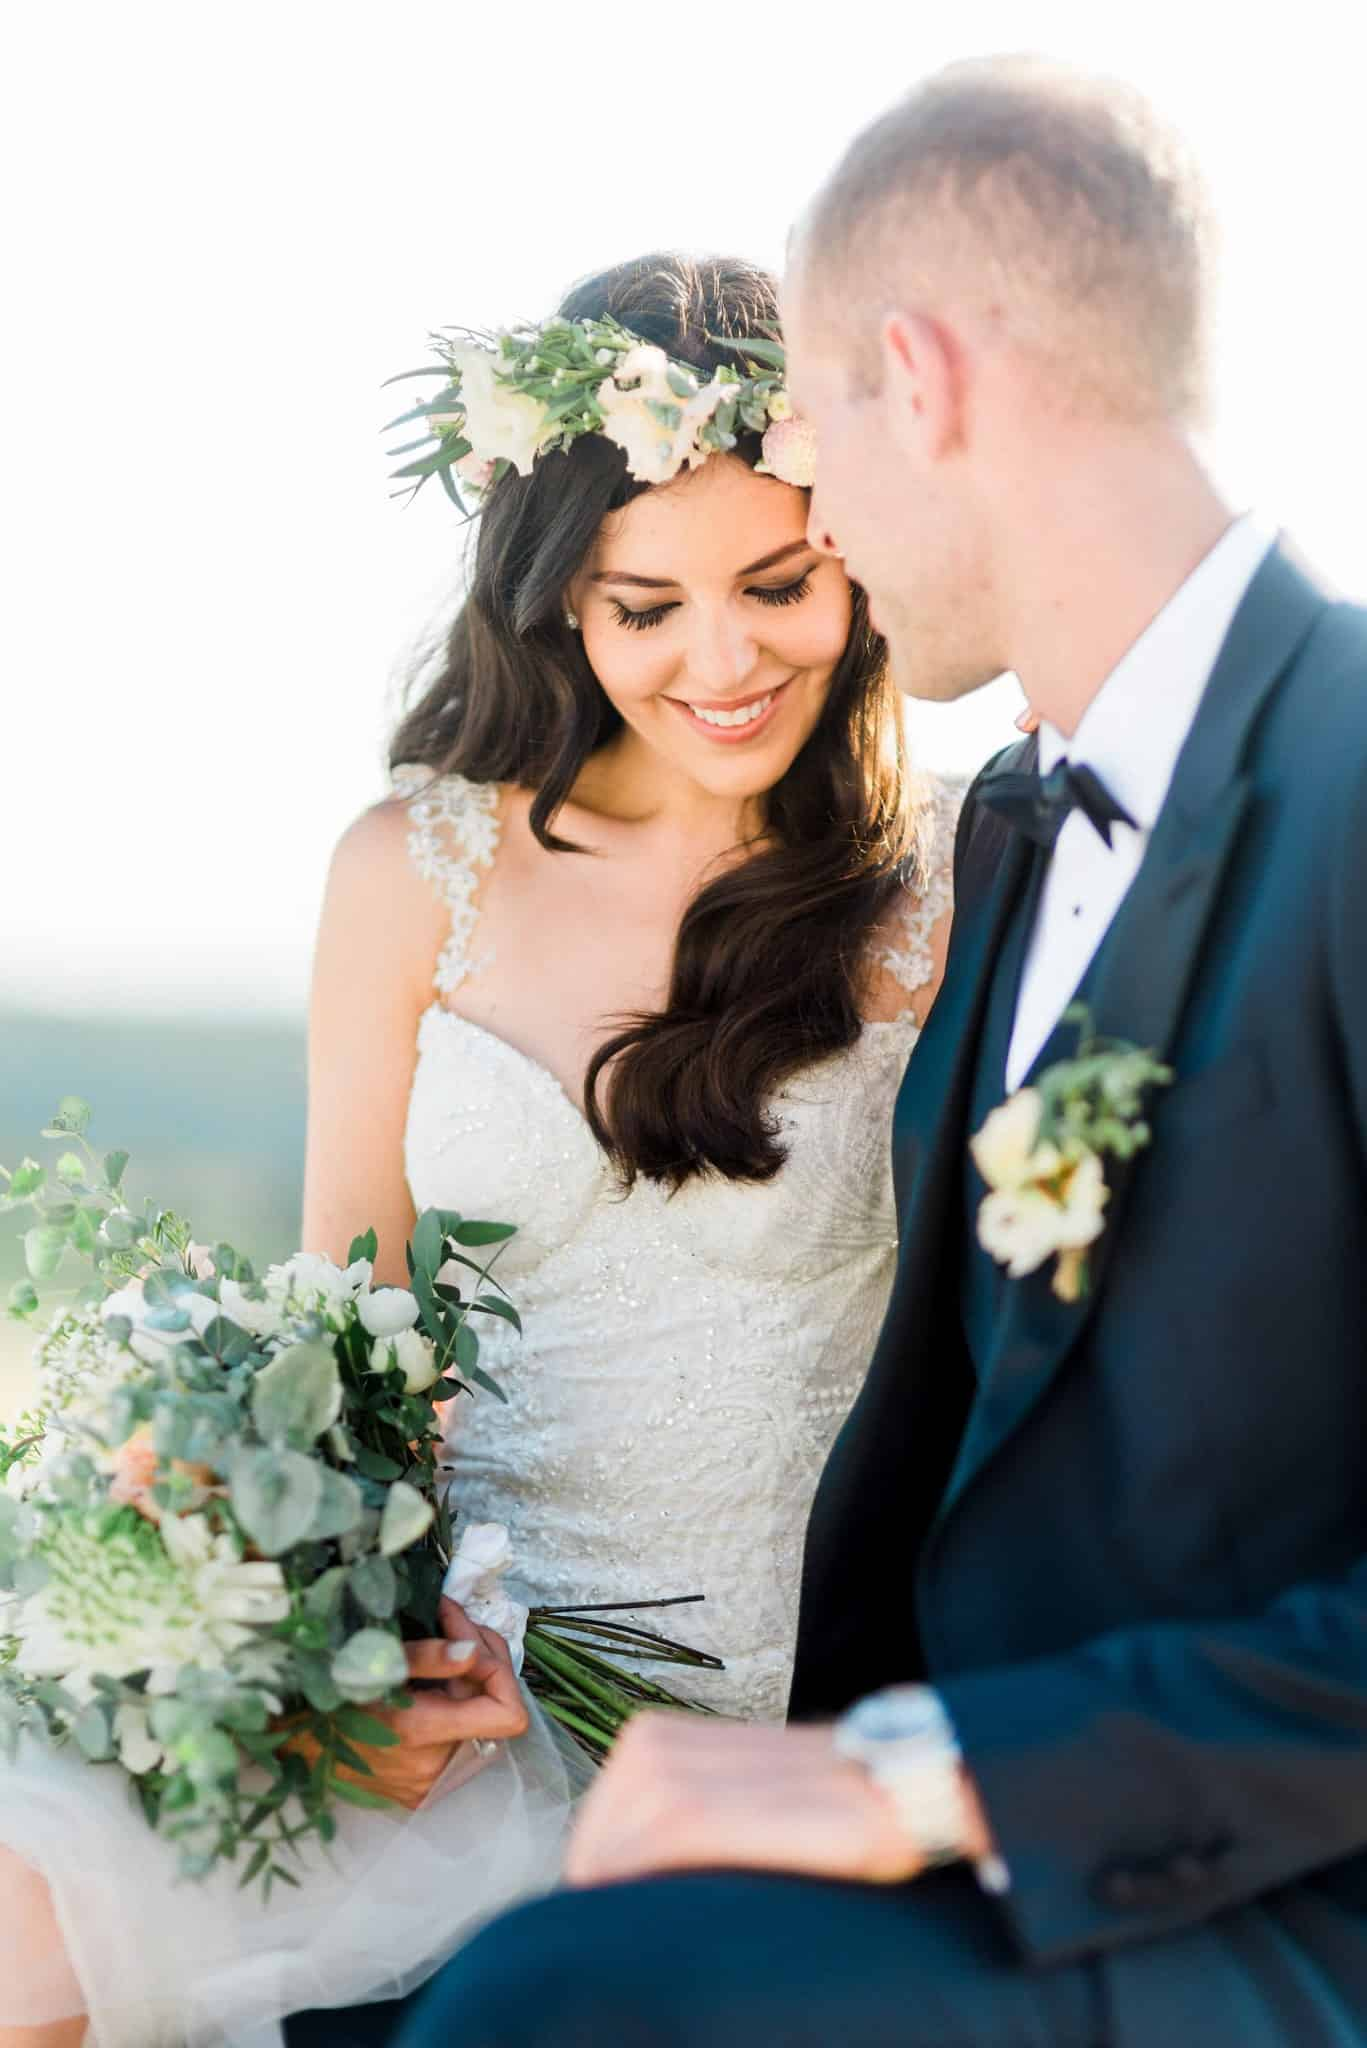 Wedoverhills_Prewedding_Italy_Destination_Wedding_Photographer_0028